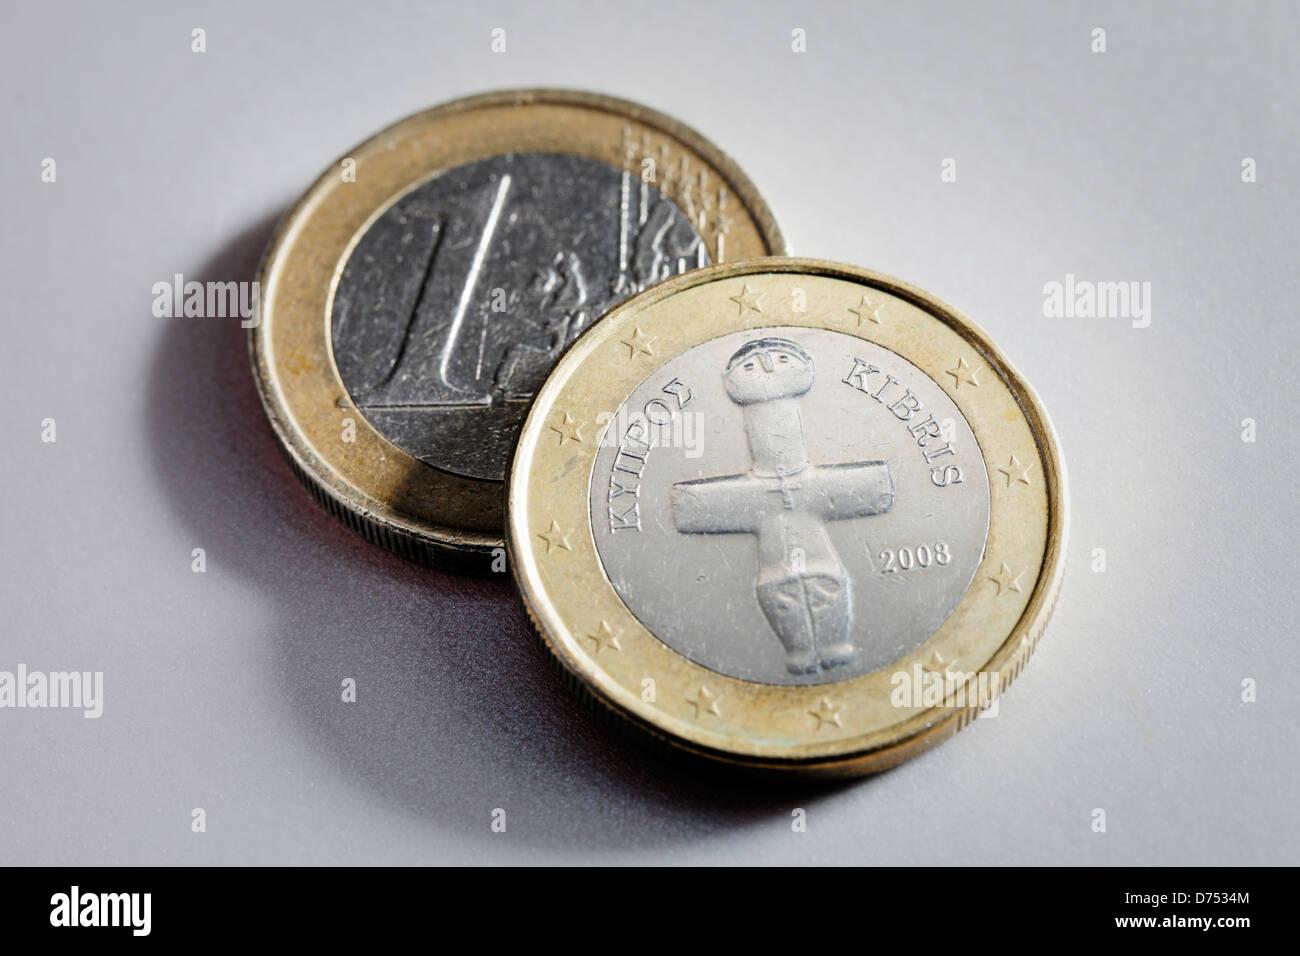 Zwei 1 Euro Münzen Aus Zypern Stockfoto Bild 56045940 Alamy